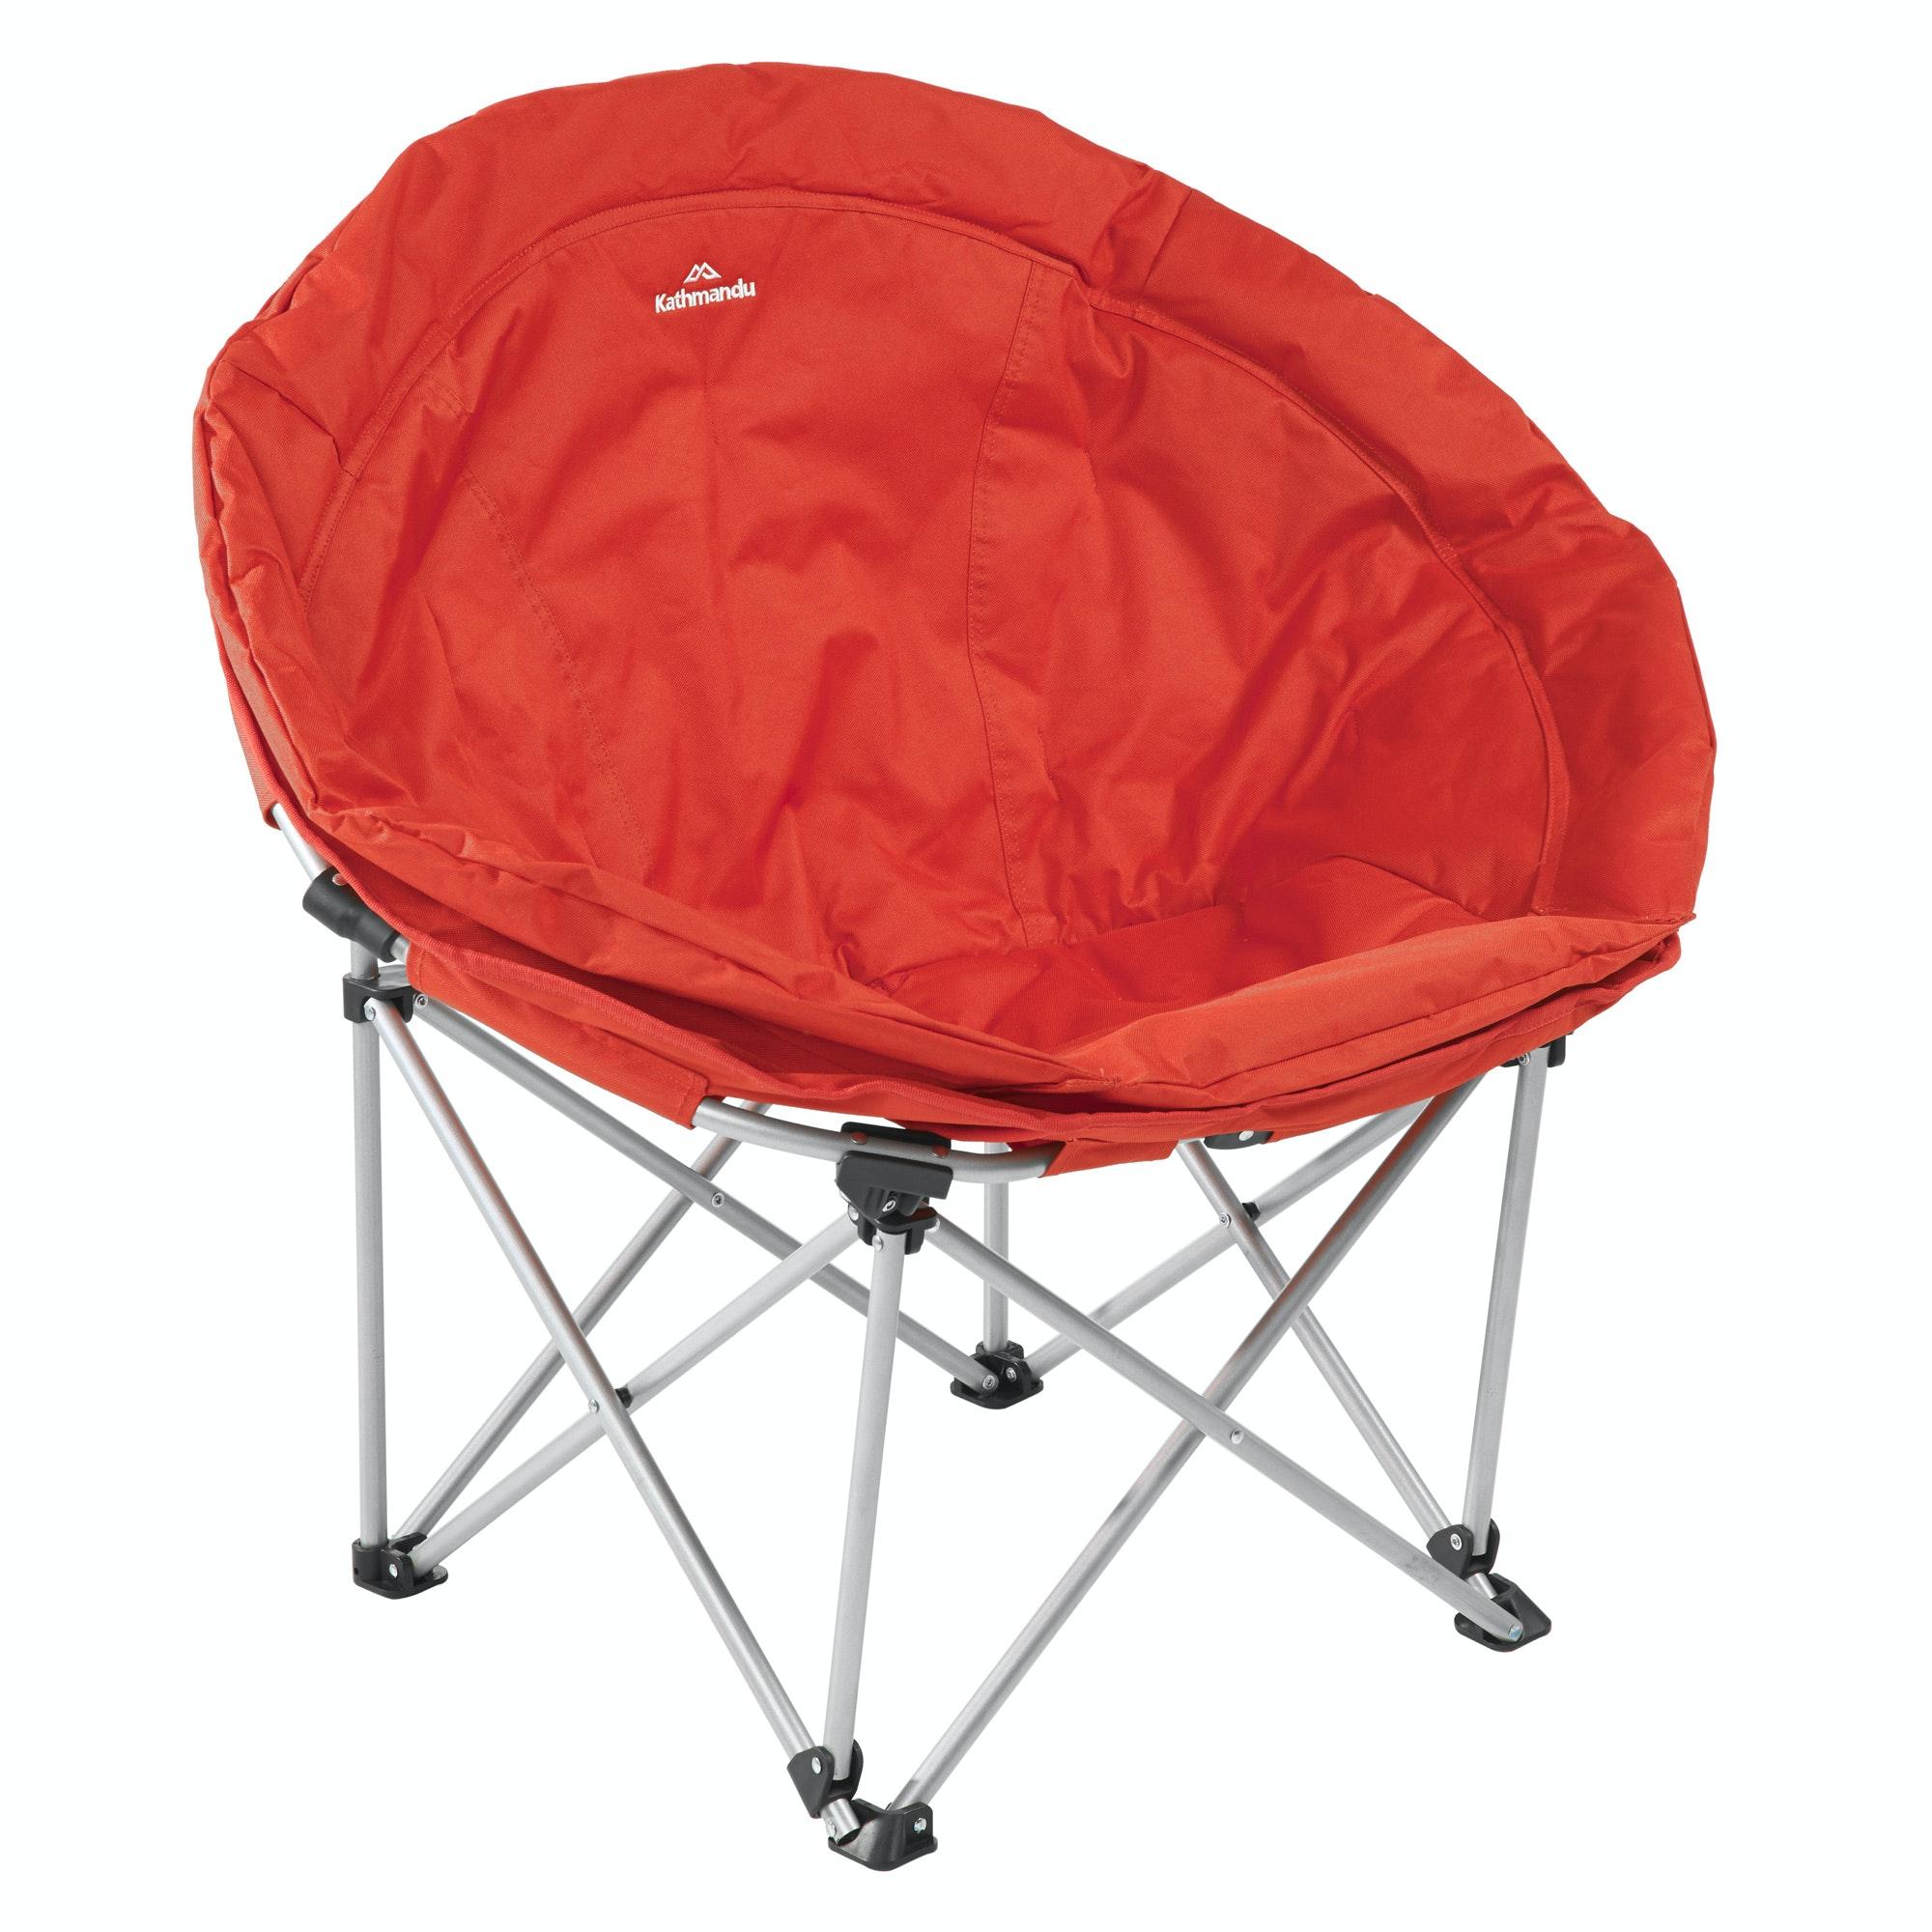 plush padded moon saucer chair in red swivel recliner real leather kathmandu retreat folding ebay